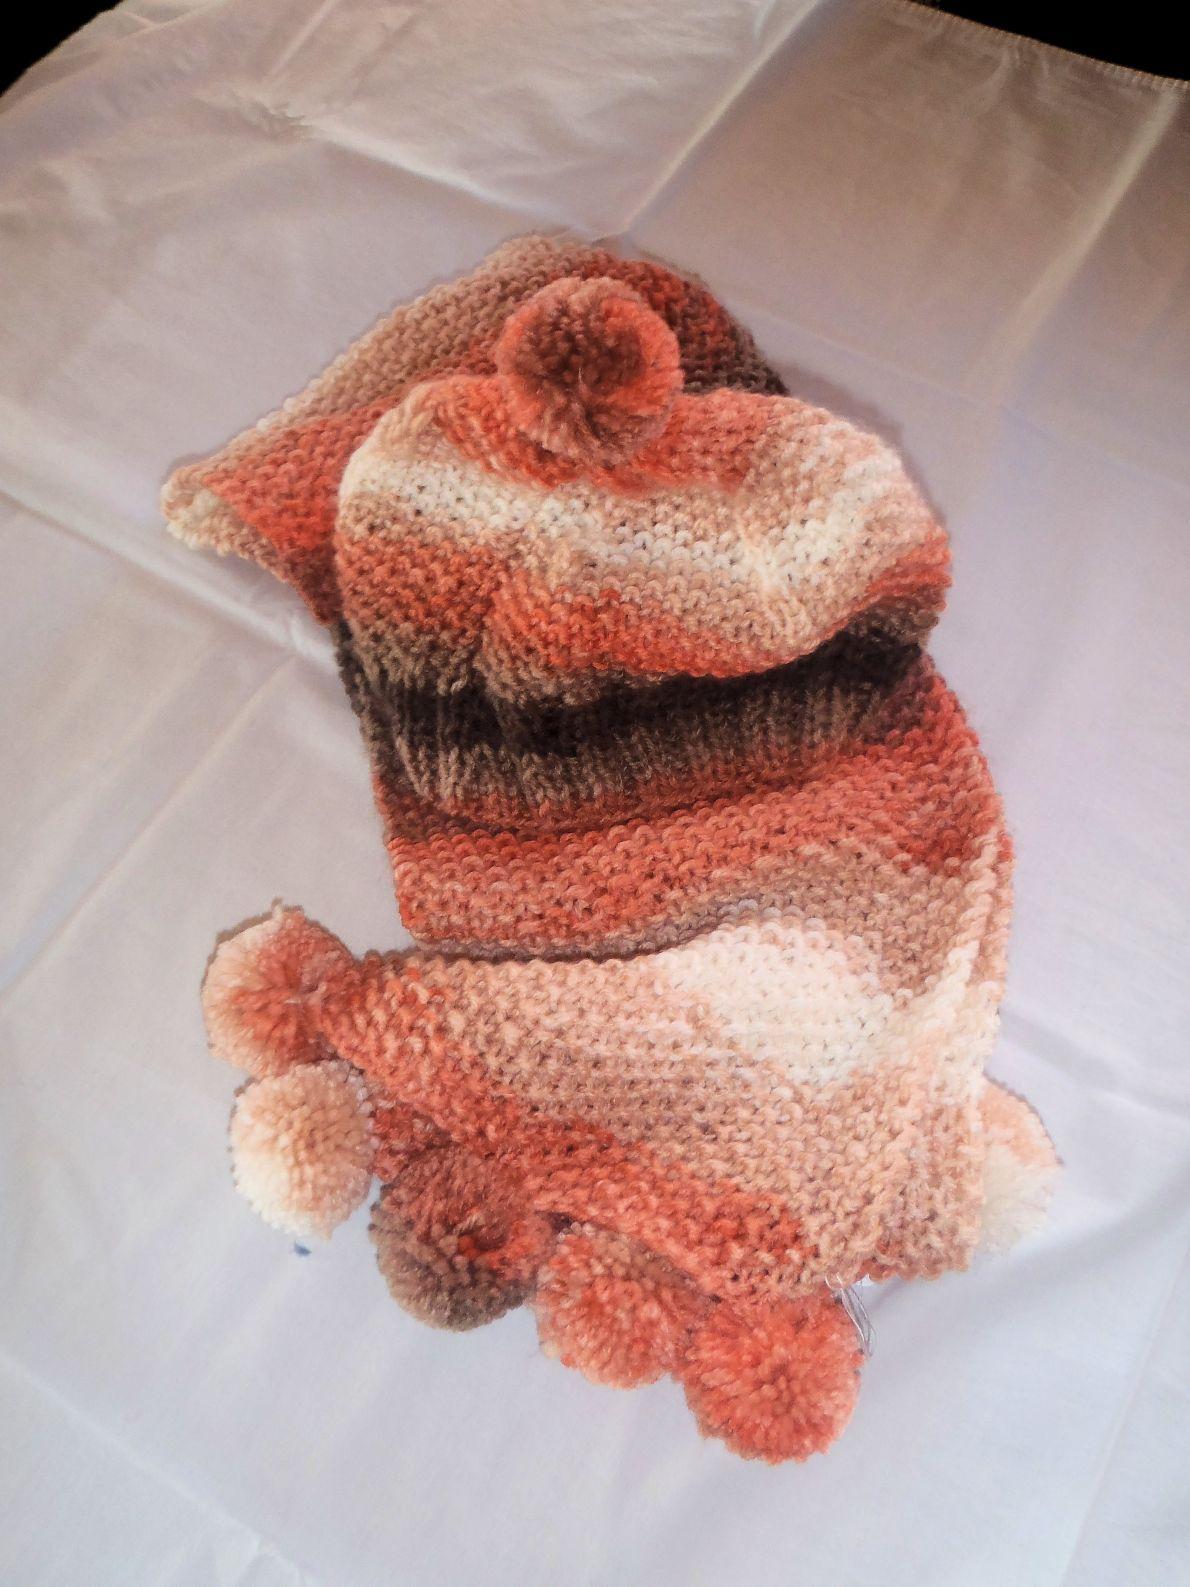 1bd11cc9851 Παιδικό σετ Σκούφος-Κασκόλ · RK Wool Creations · Online Store ...